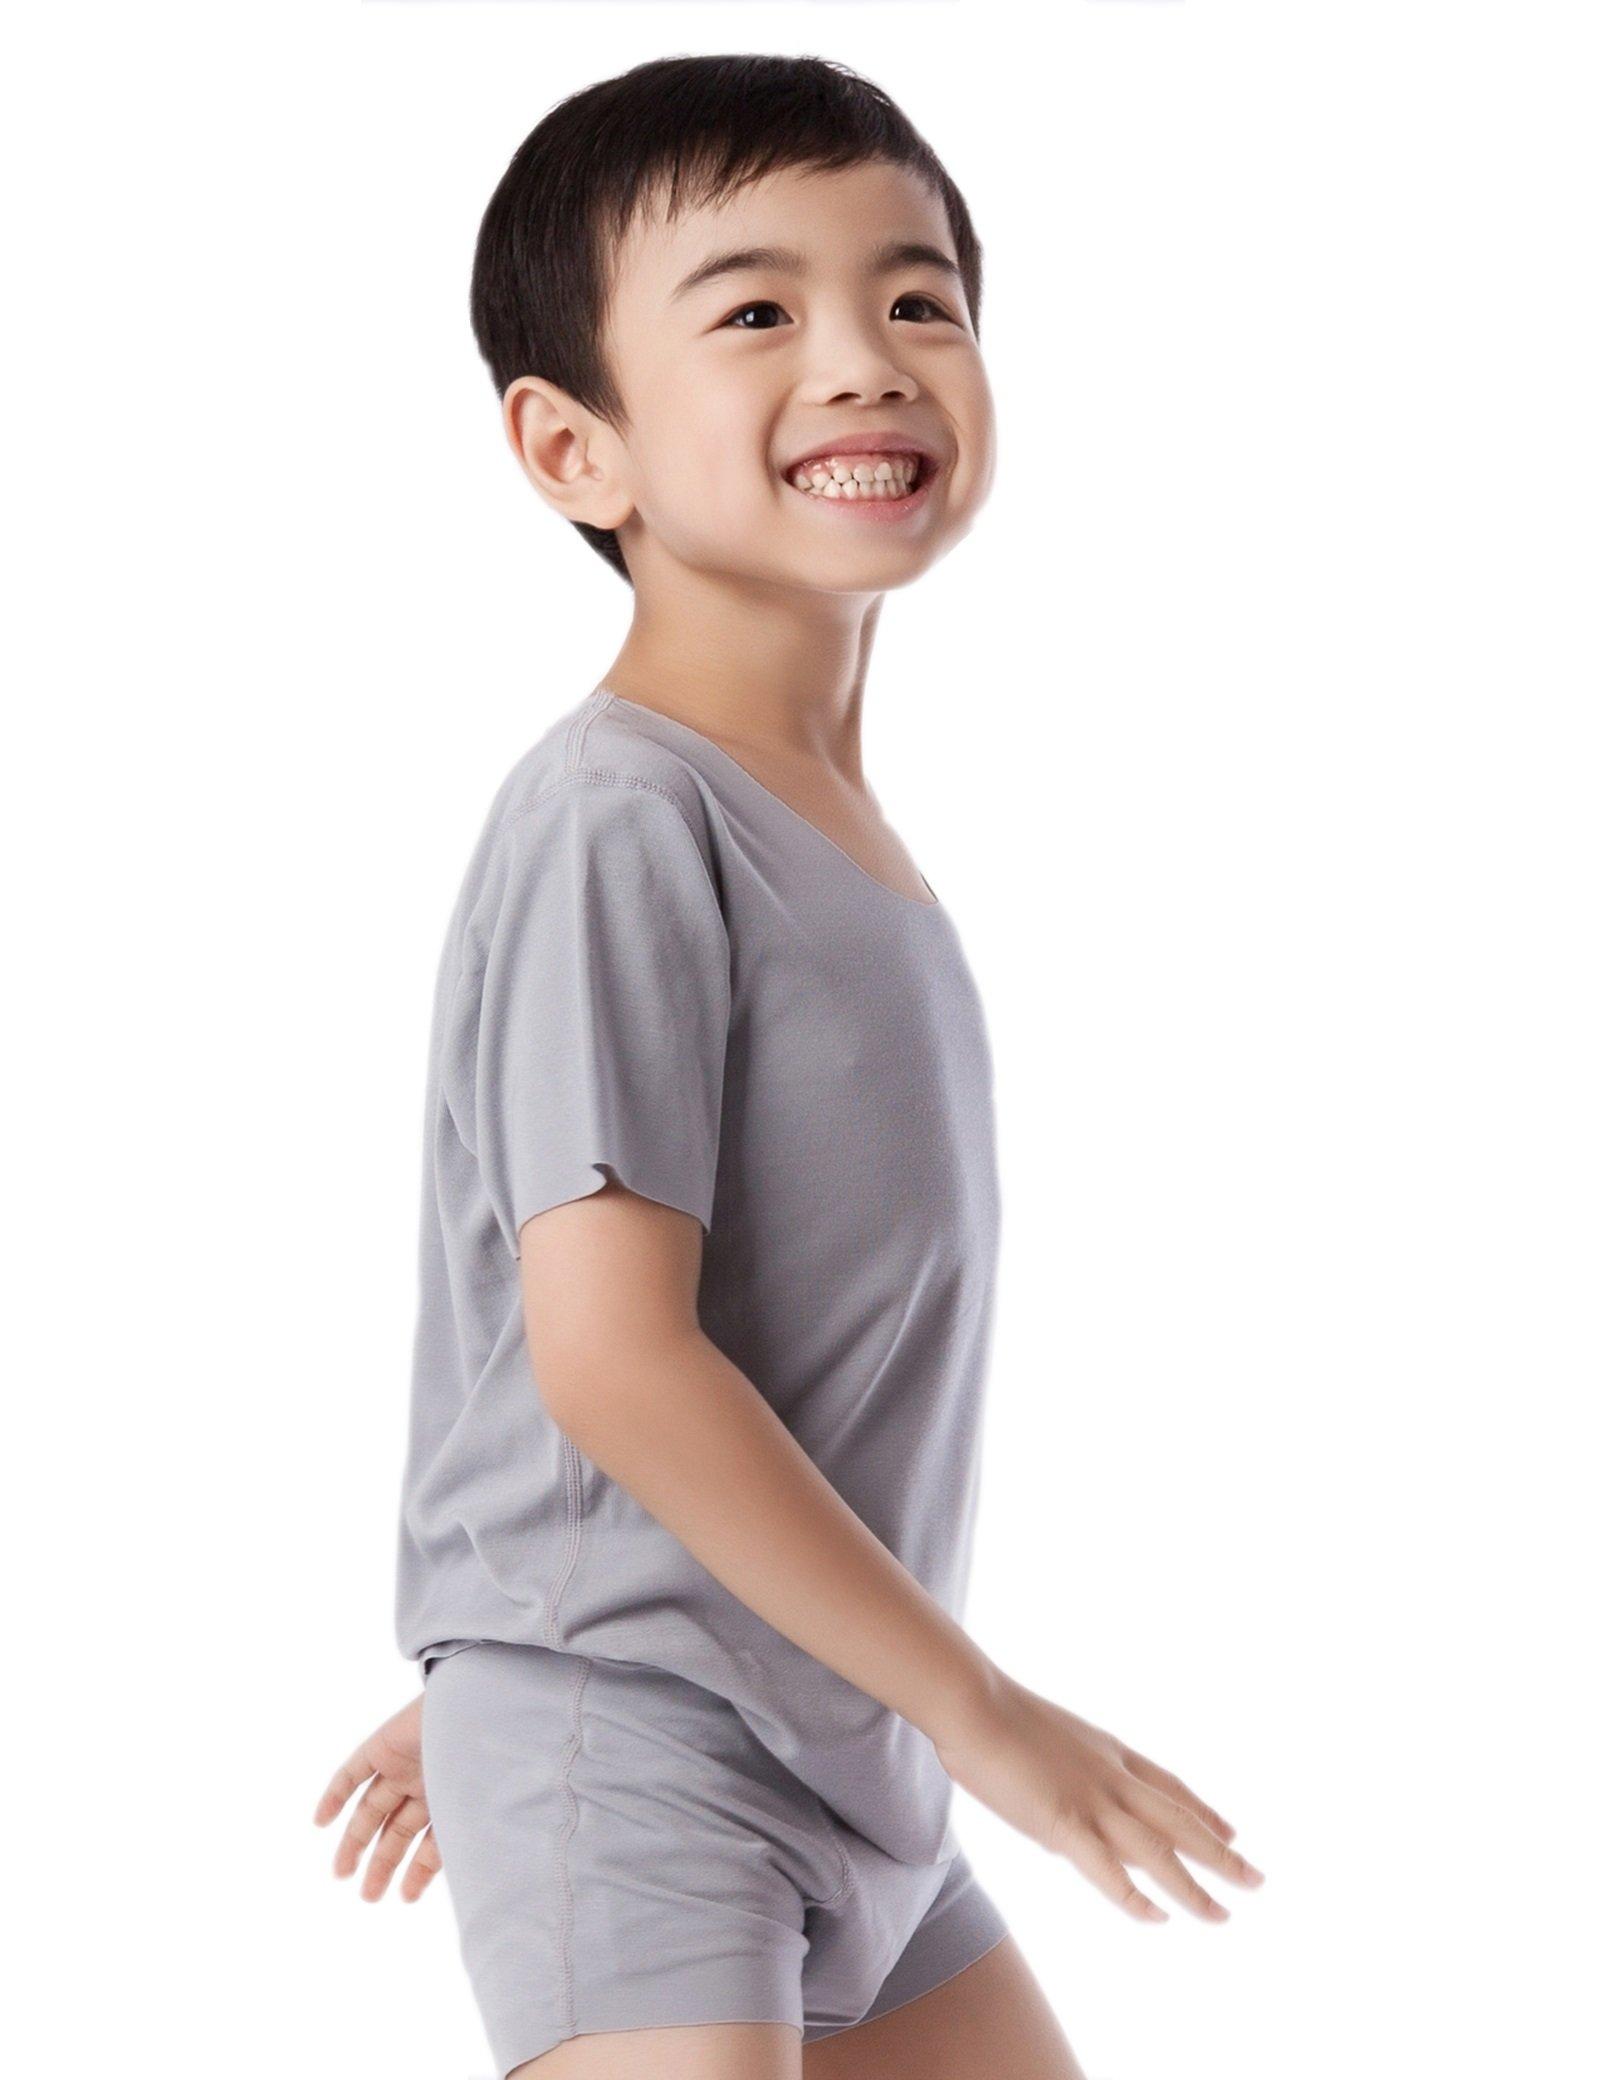 NASSE Boys Crew Neck Short Sleeve Undershirts Free-Cut Cotton Tee Shirts (XL, Grey)